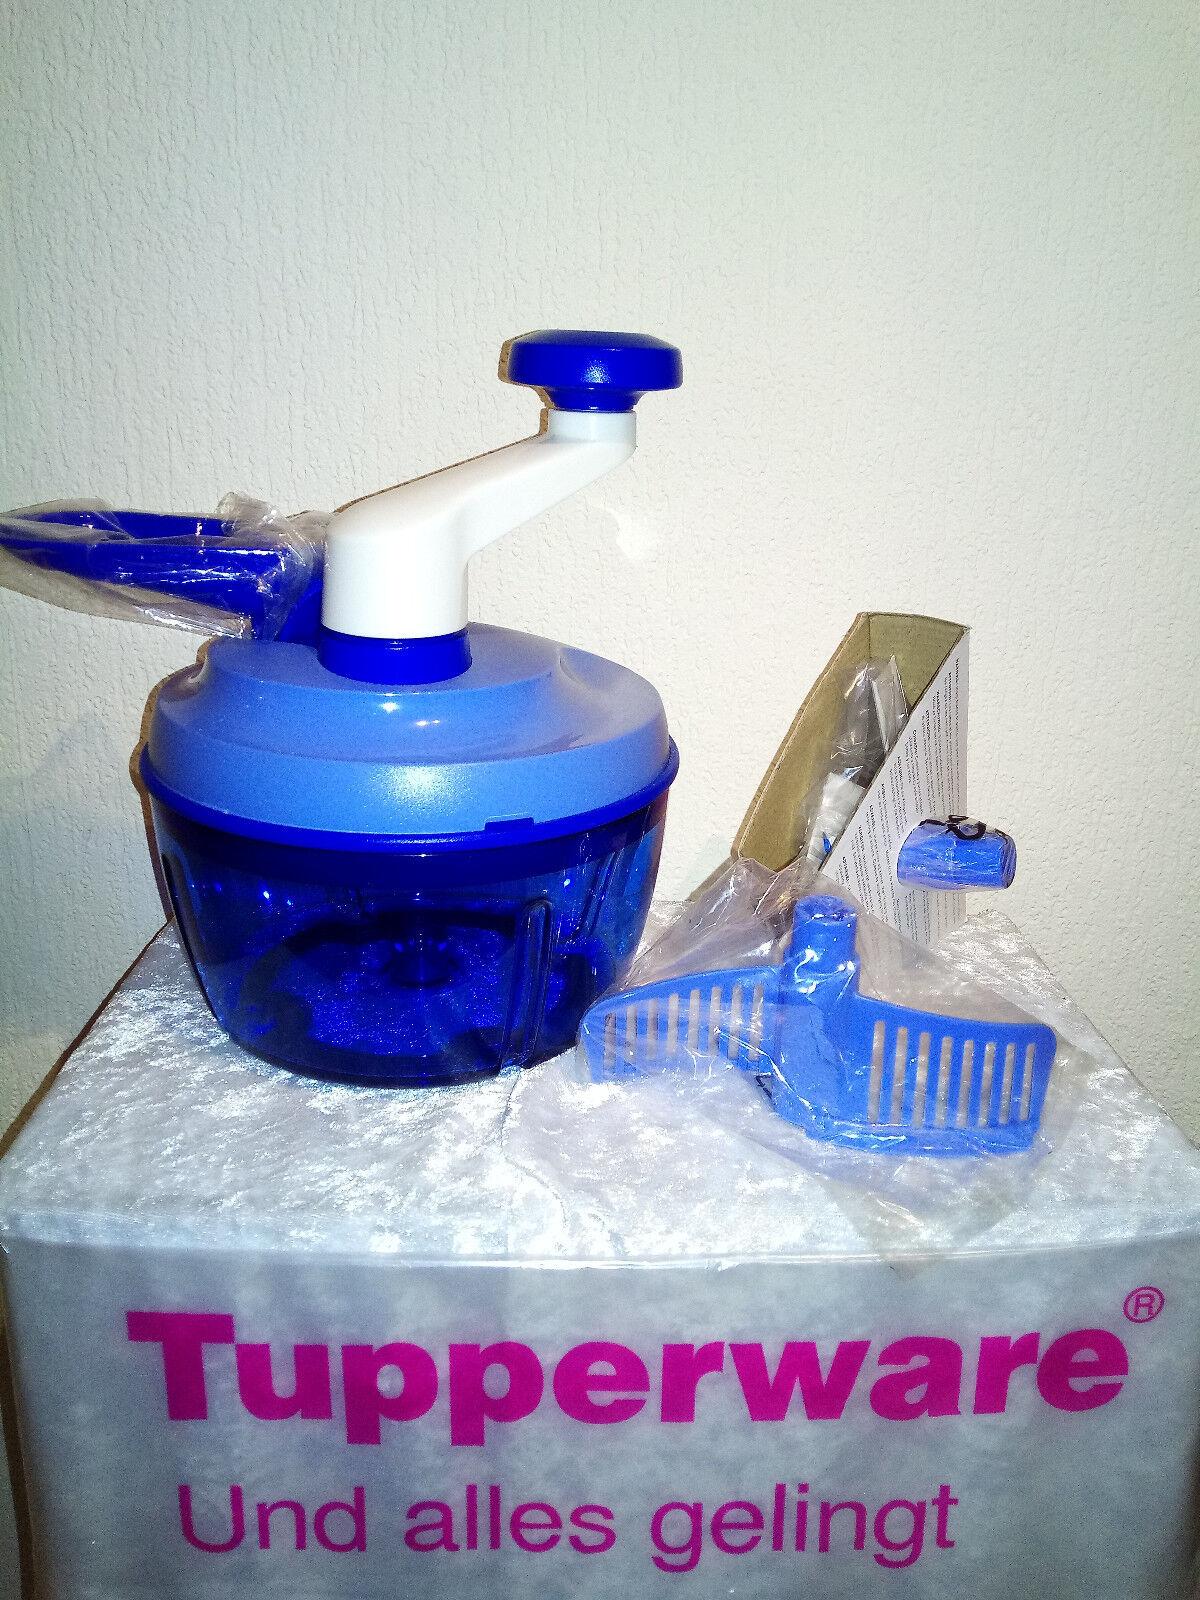 TUPPERWARE Quick Chef 2 Messer blau NEU OVP